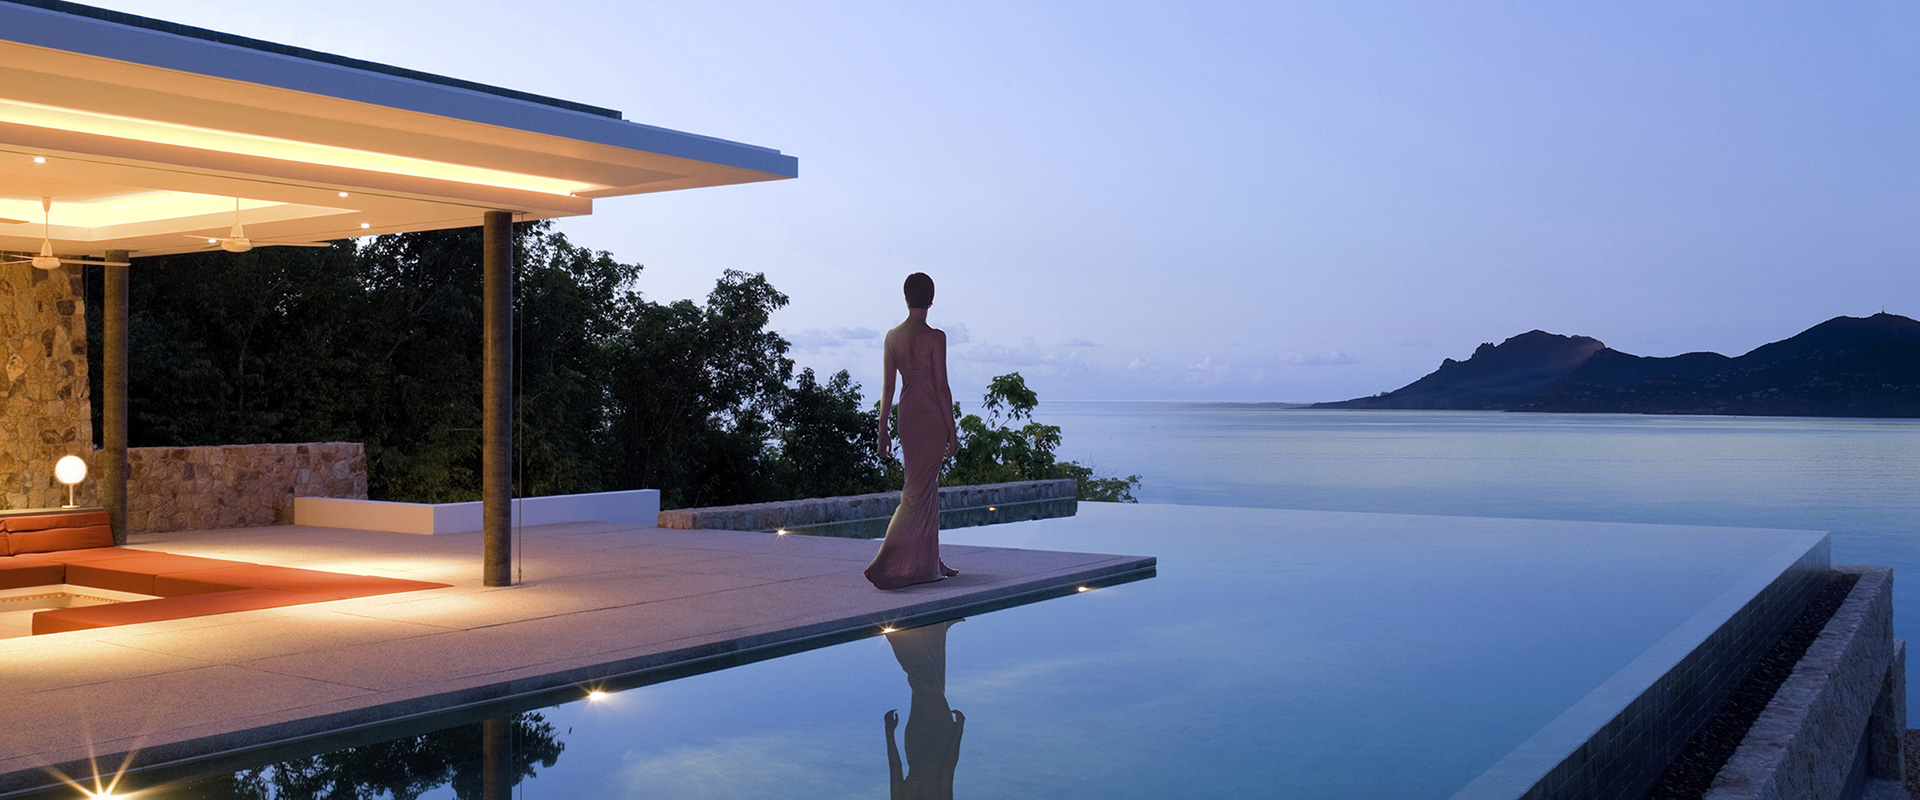 PROPERTIES | French riviera luxury real estate | Platinium Riviera